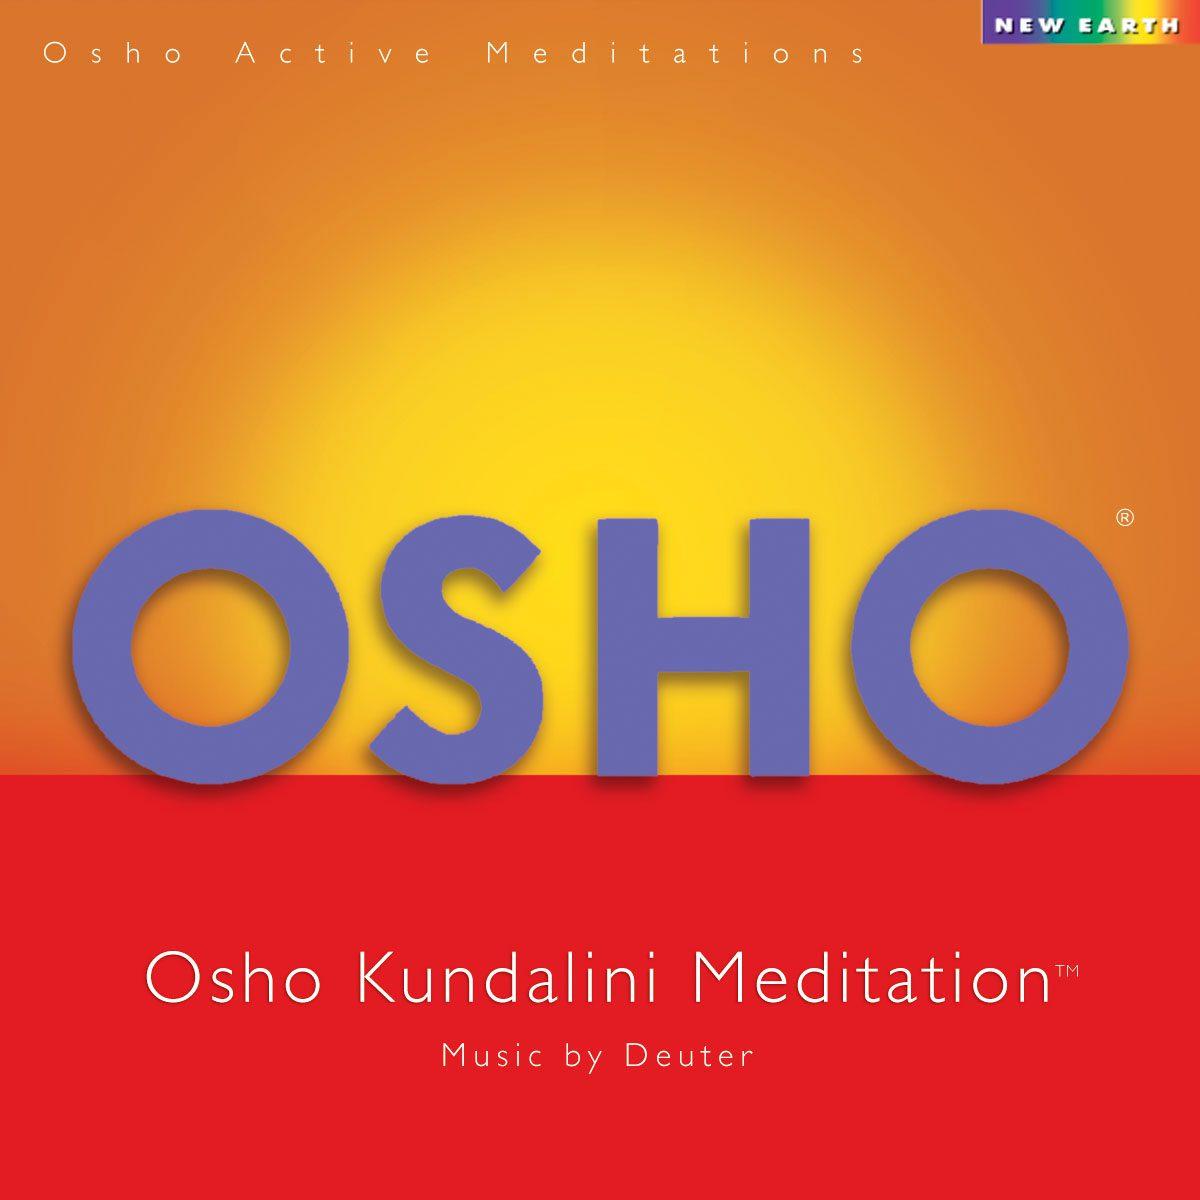 Osho Kundalini Meditatie